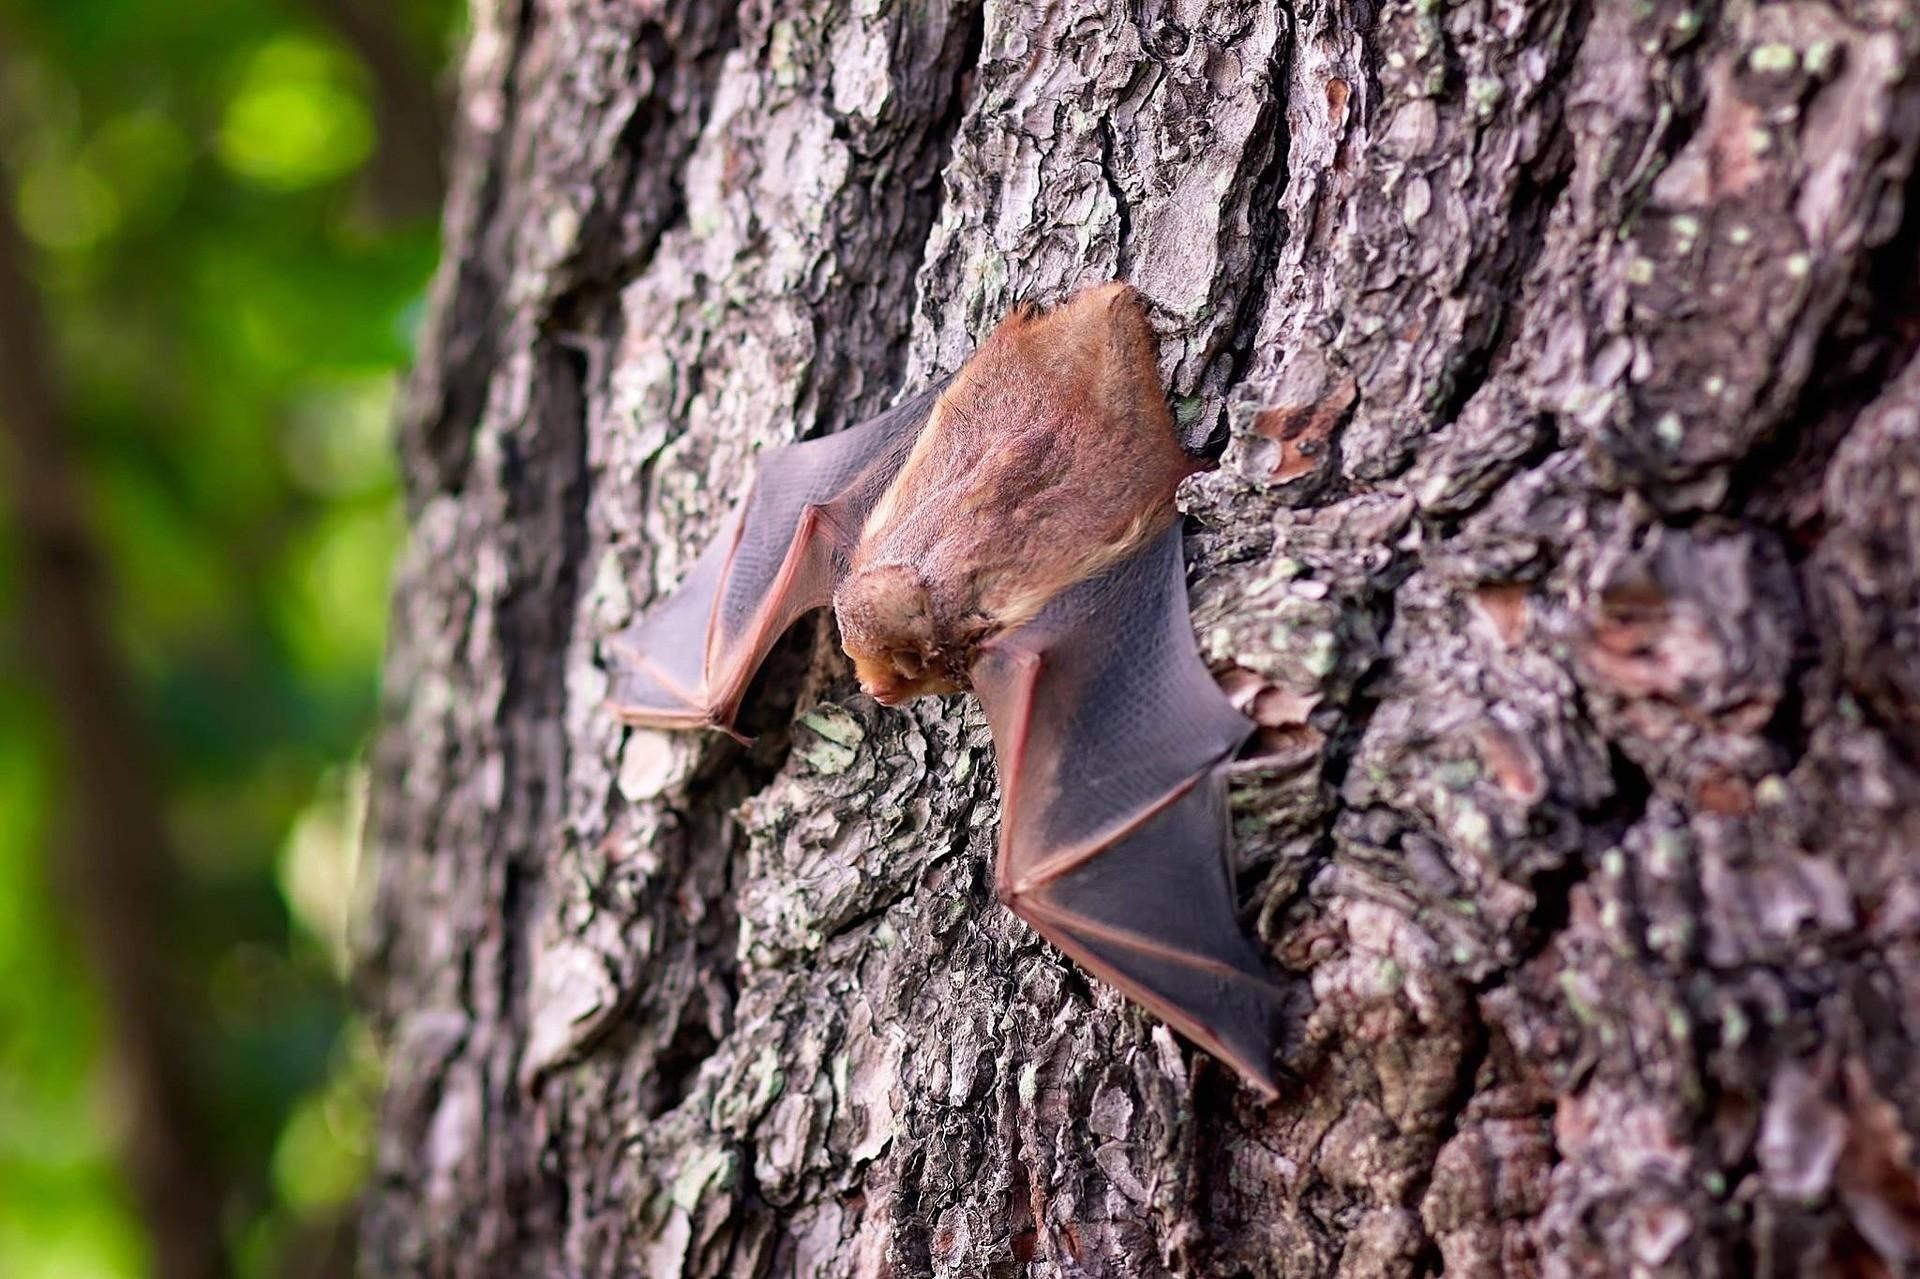 Morcego encontrado no bairro Brasilia teve resultado positivo para raiva